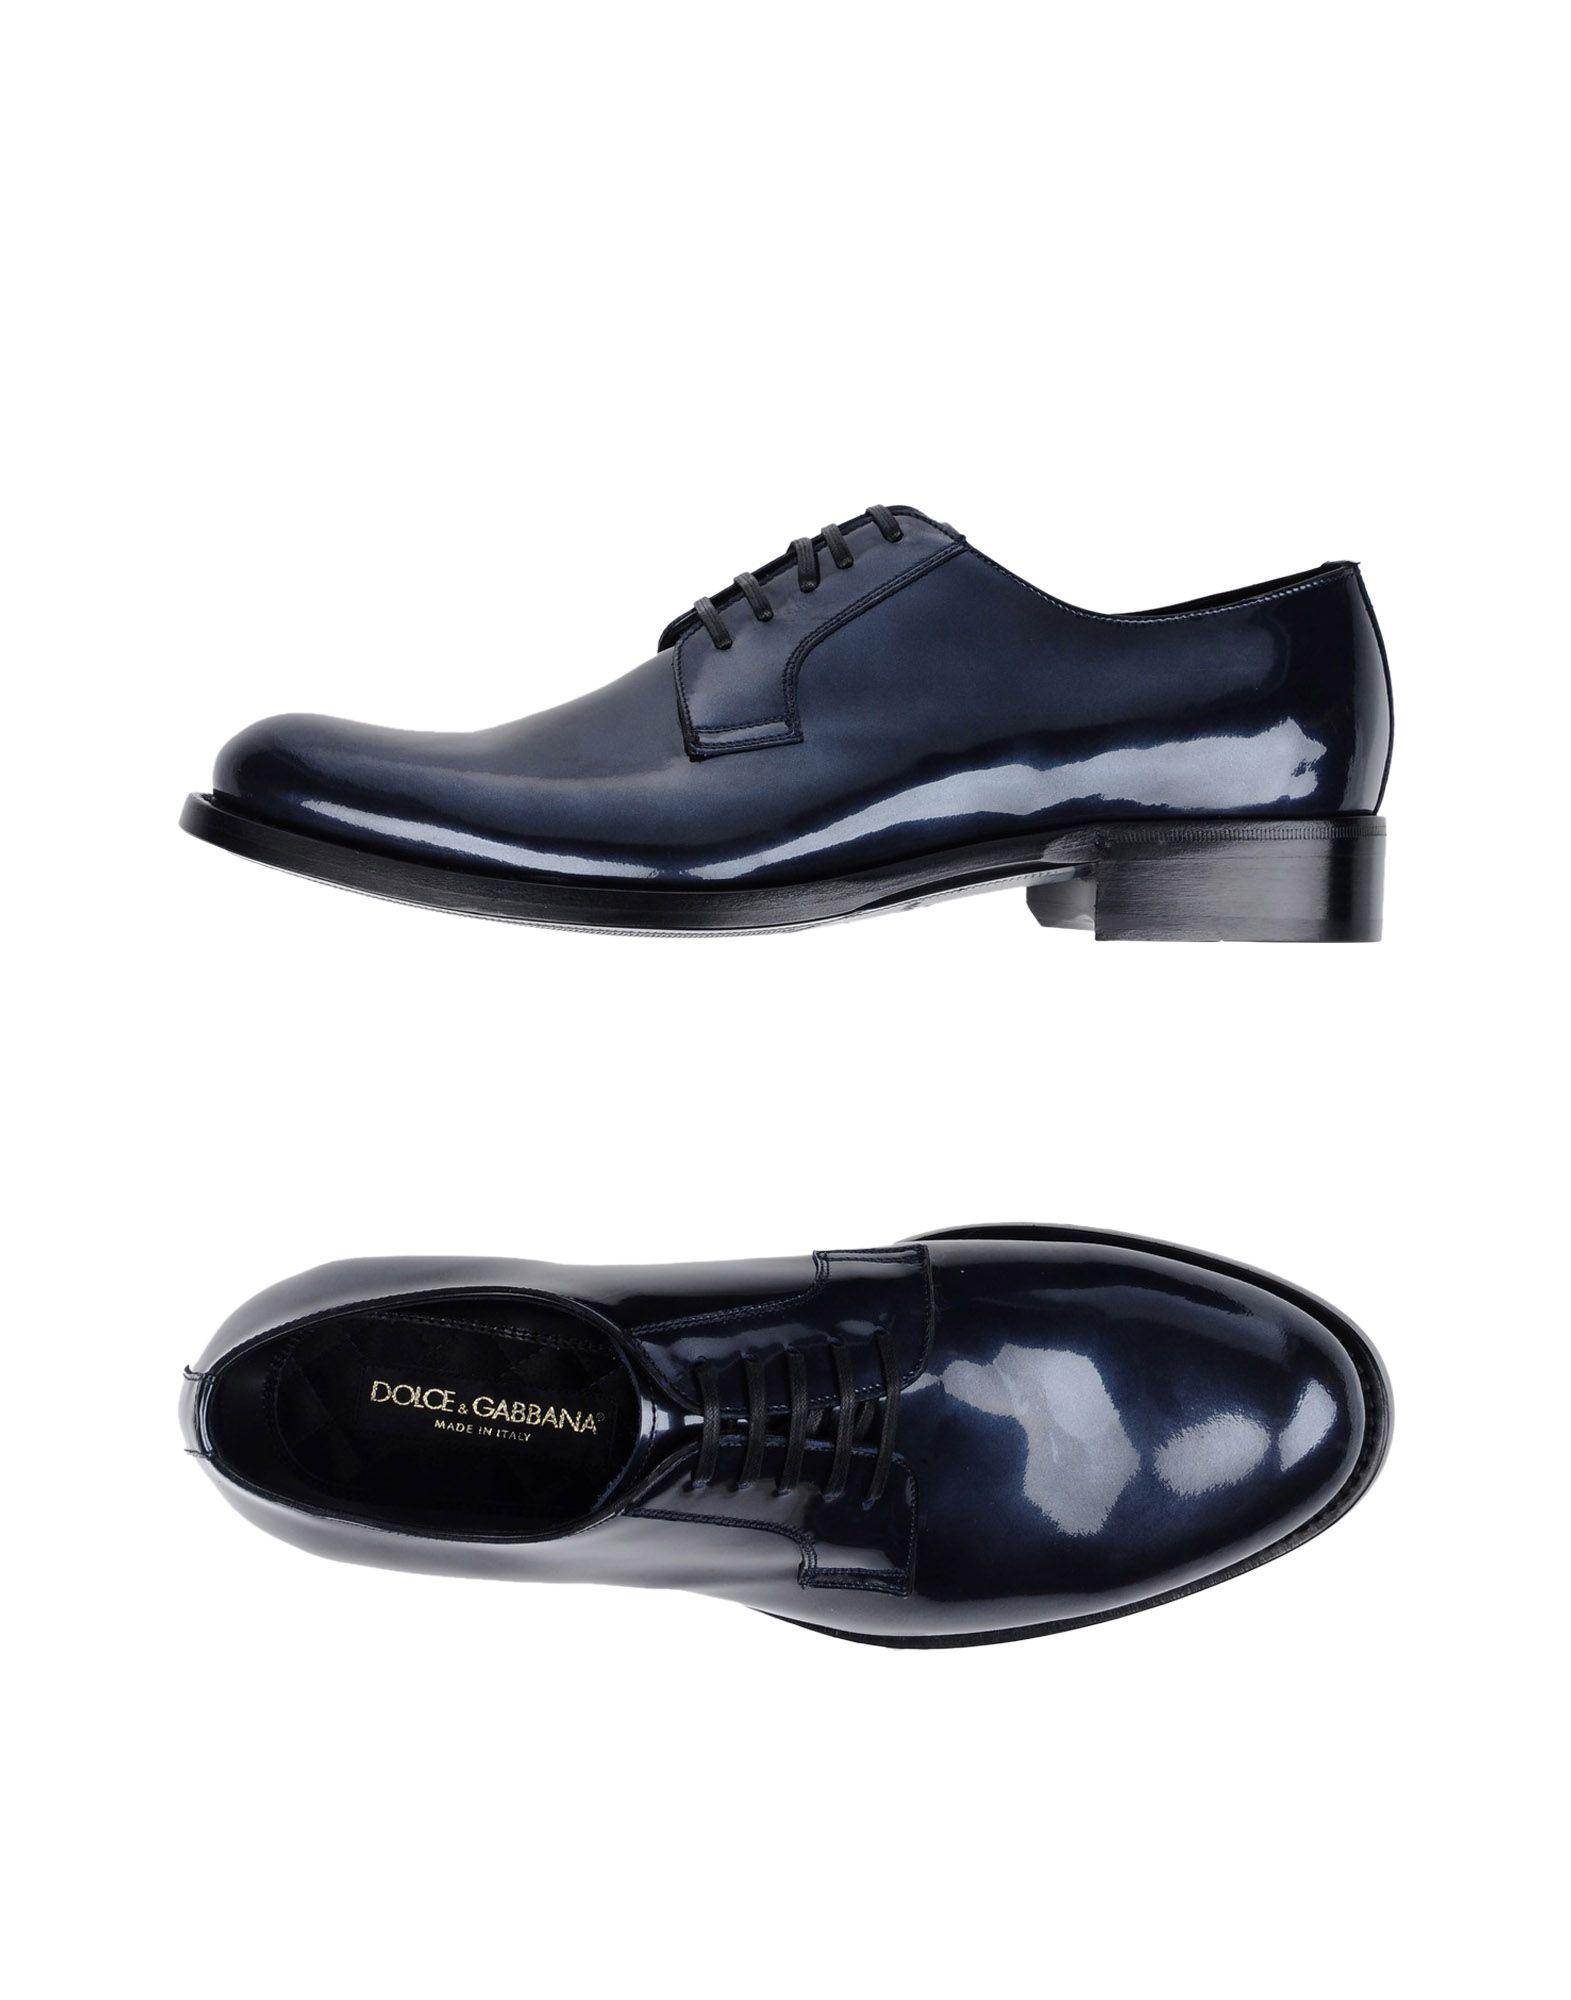 Stringate Dolce & Gabbana Uomo - 11327597GX